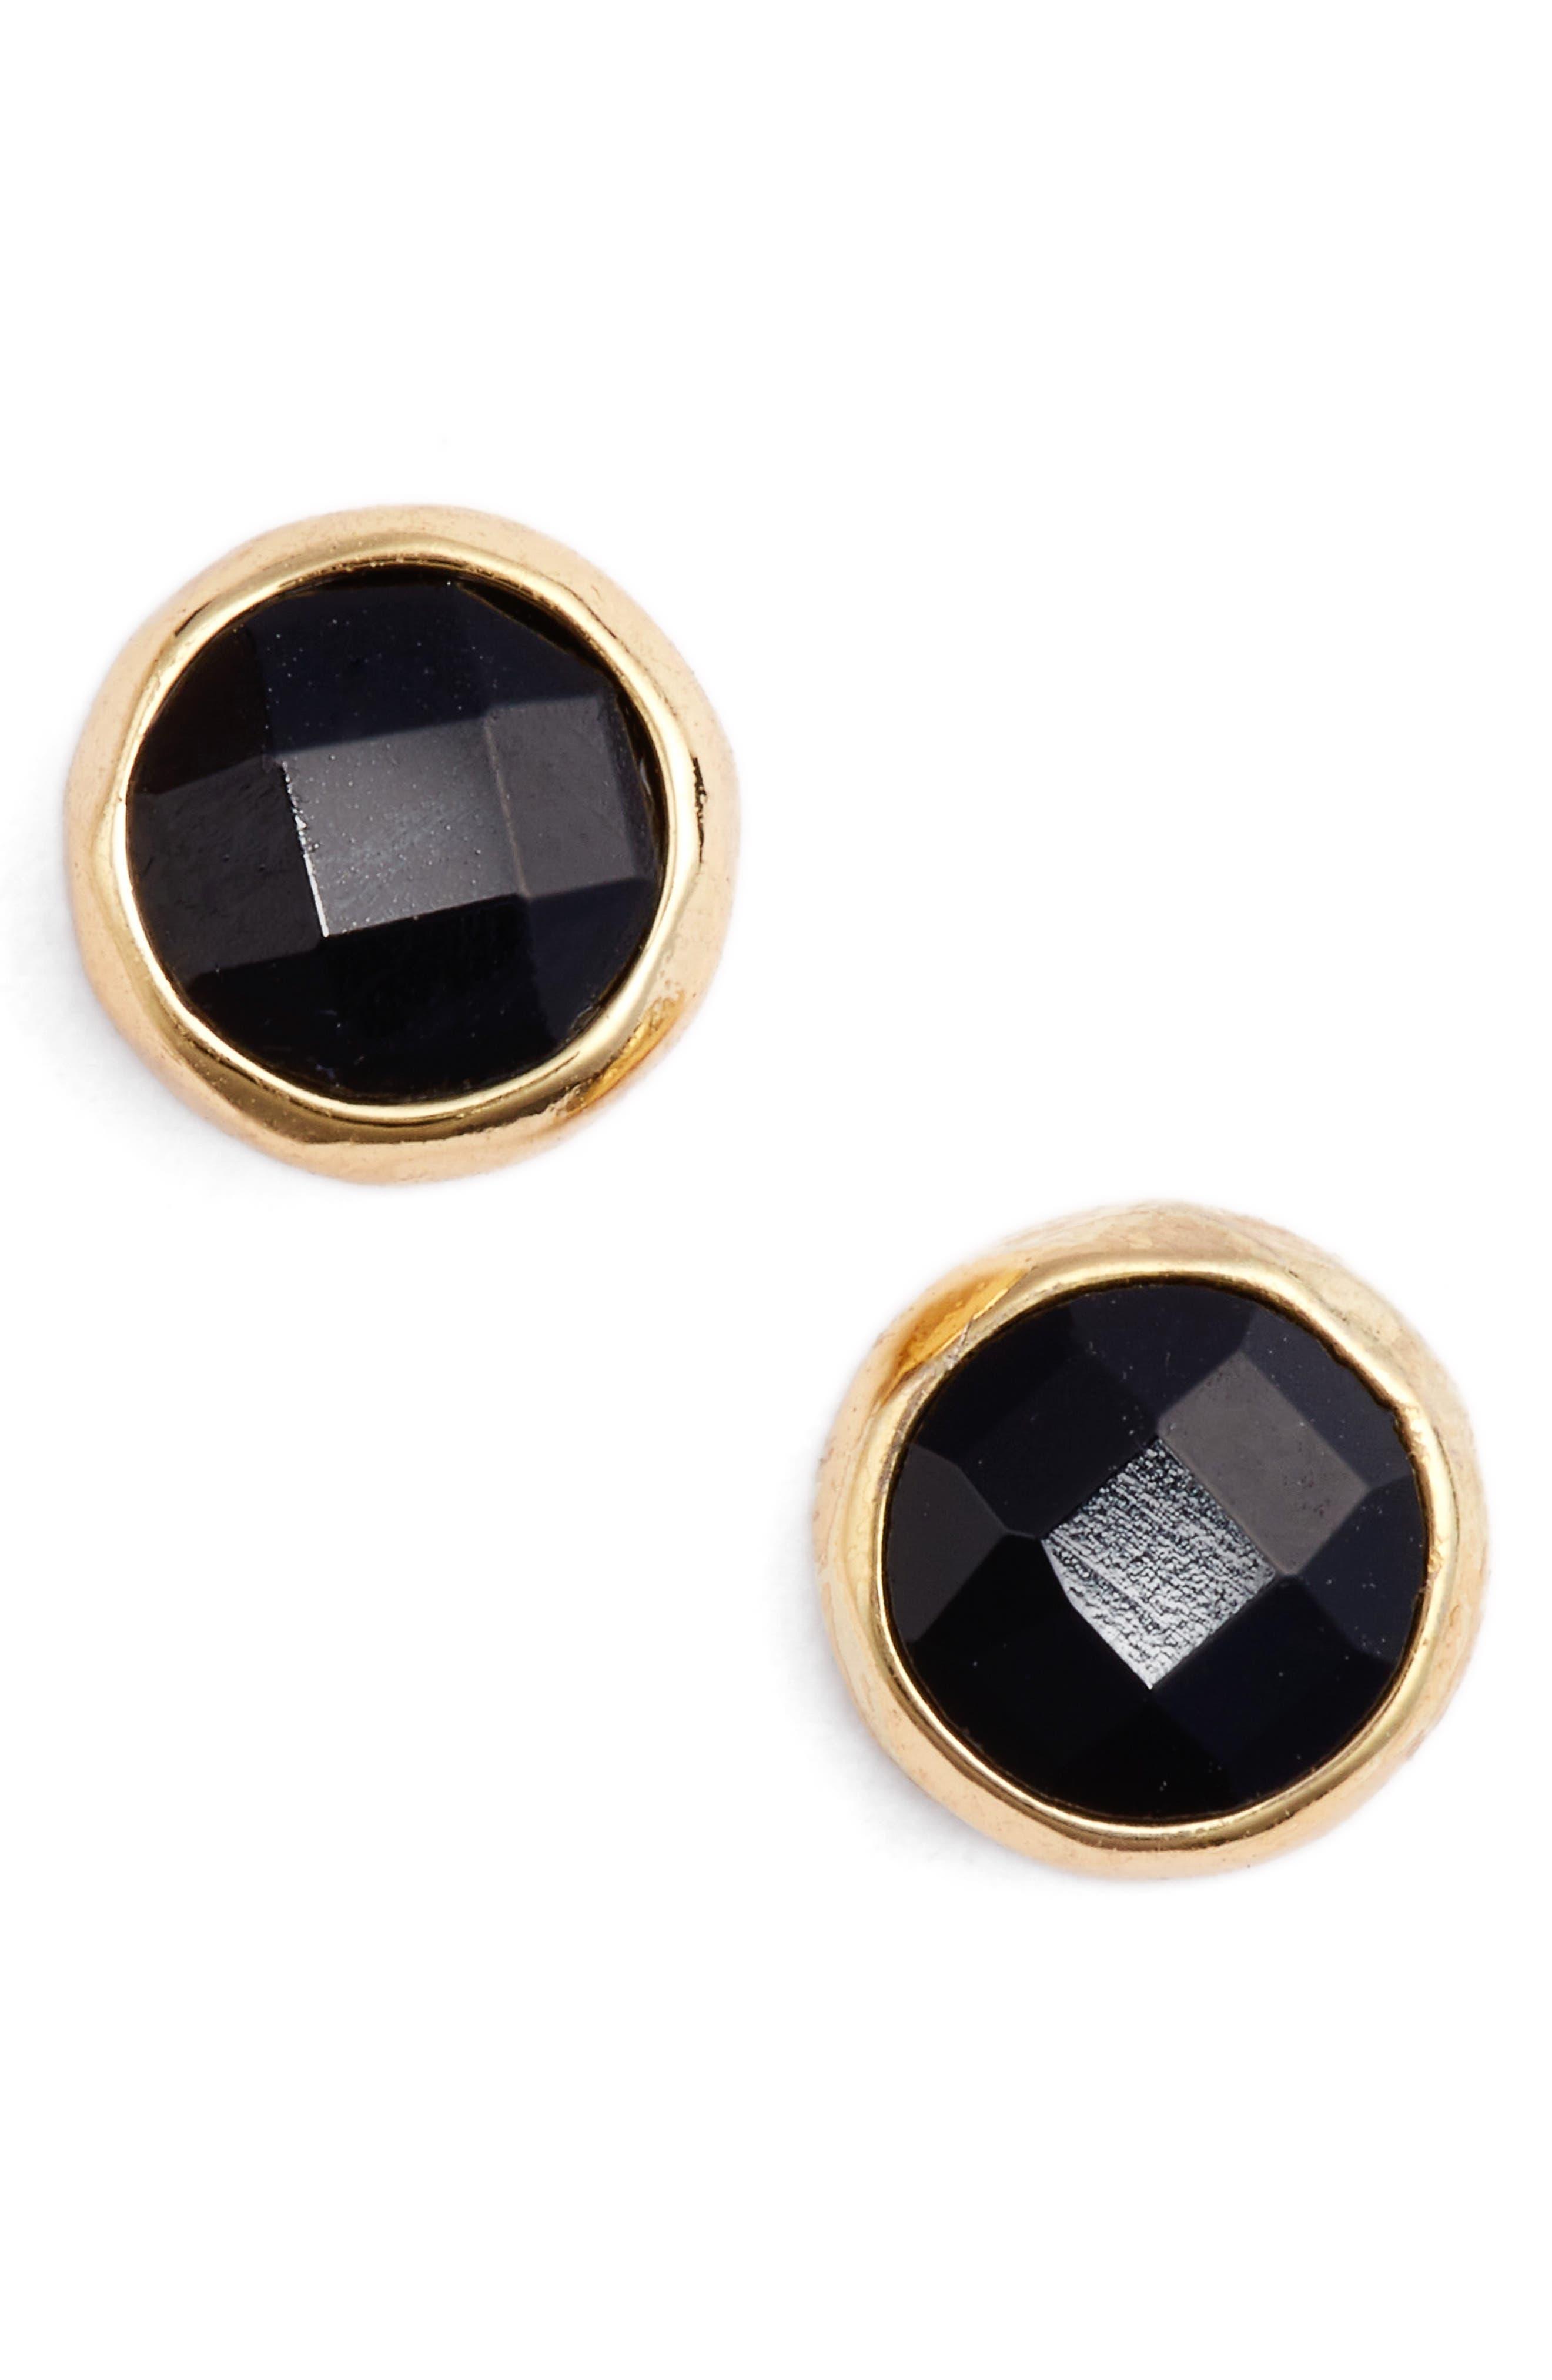 GORJANA, Protection Stud Earrings, Main thumbnail 1, color, PROTECTION/ BLACK ONYX/ GOLD